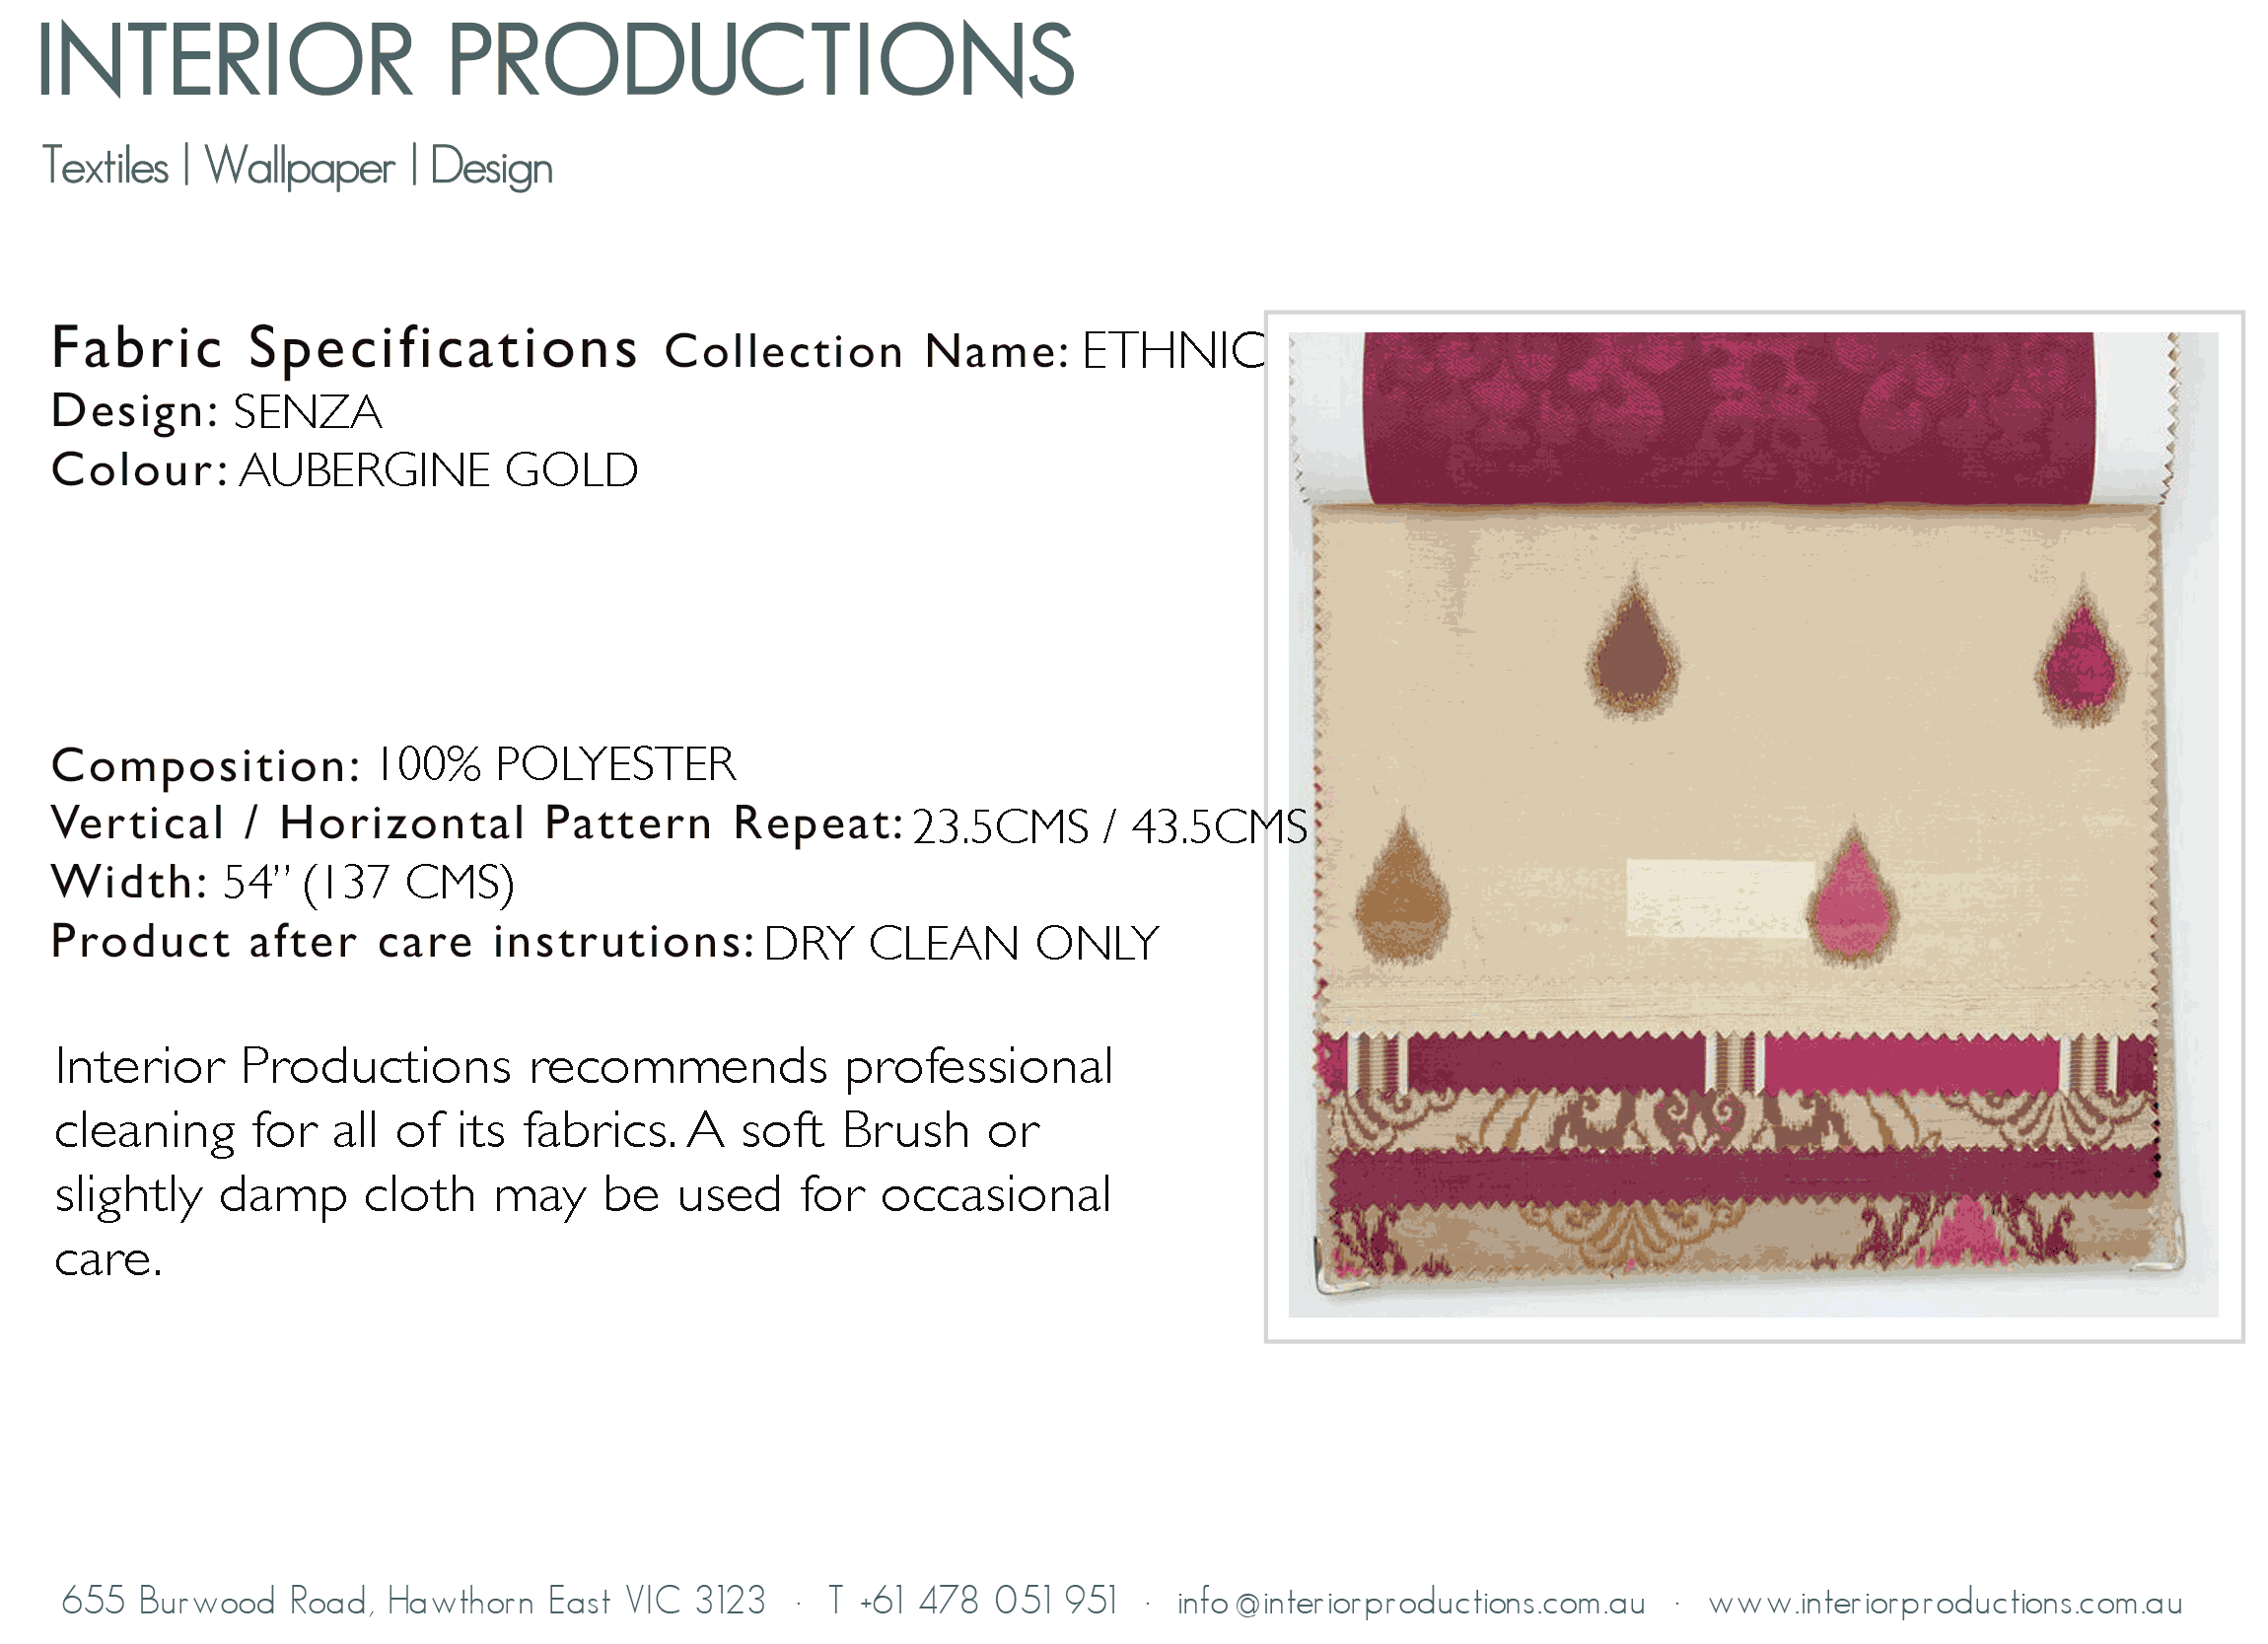 interior_productions_SENZA---AUBERGINE-GOLD